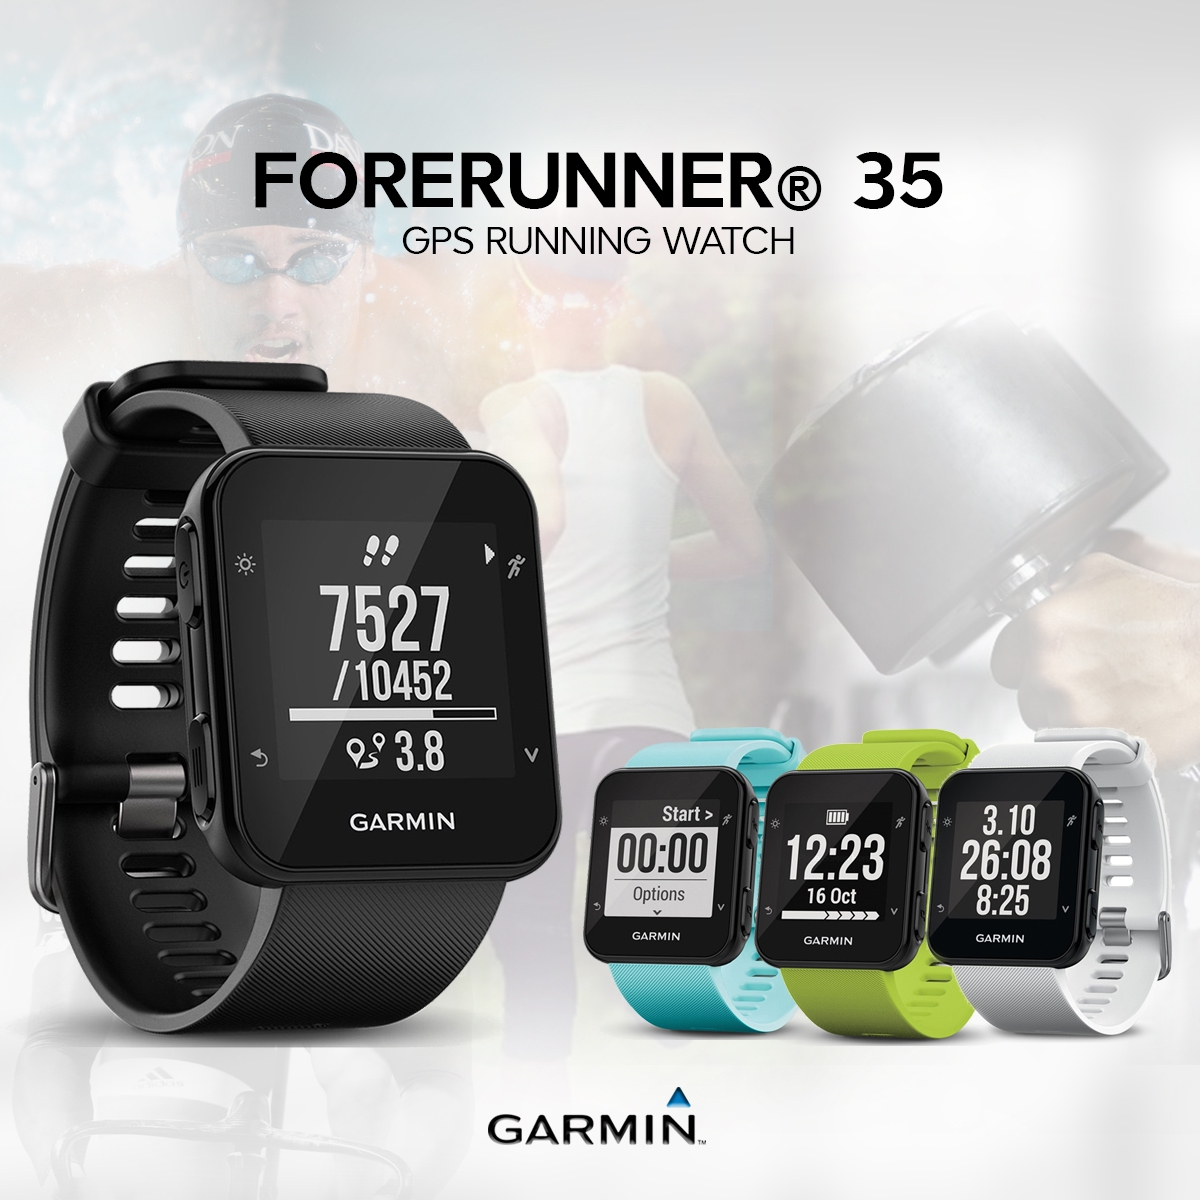 Running Limelight010 Garmin 35 Watch Forerunner Gps 01689 43 rthQsdC